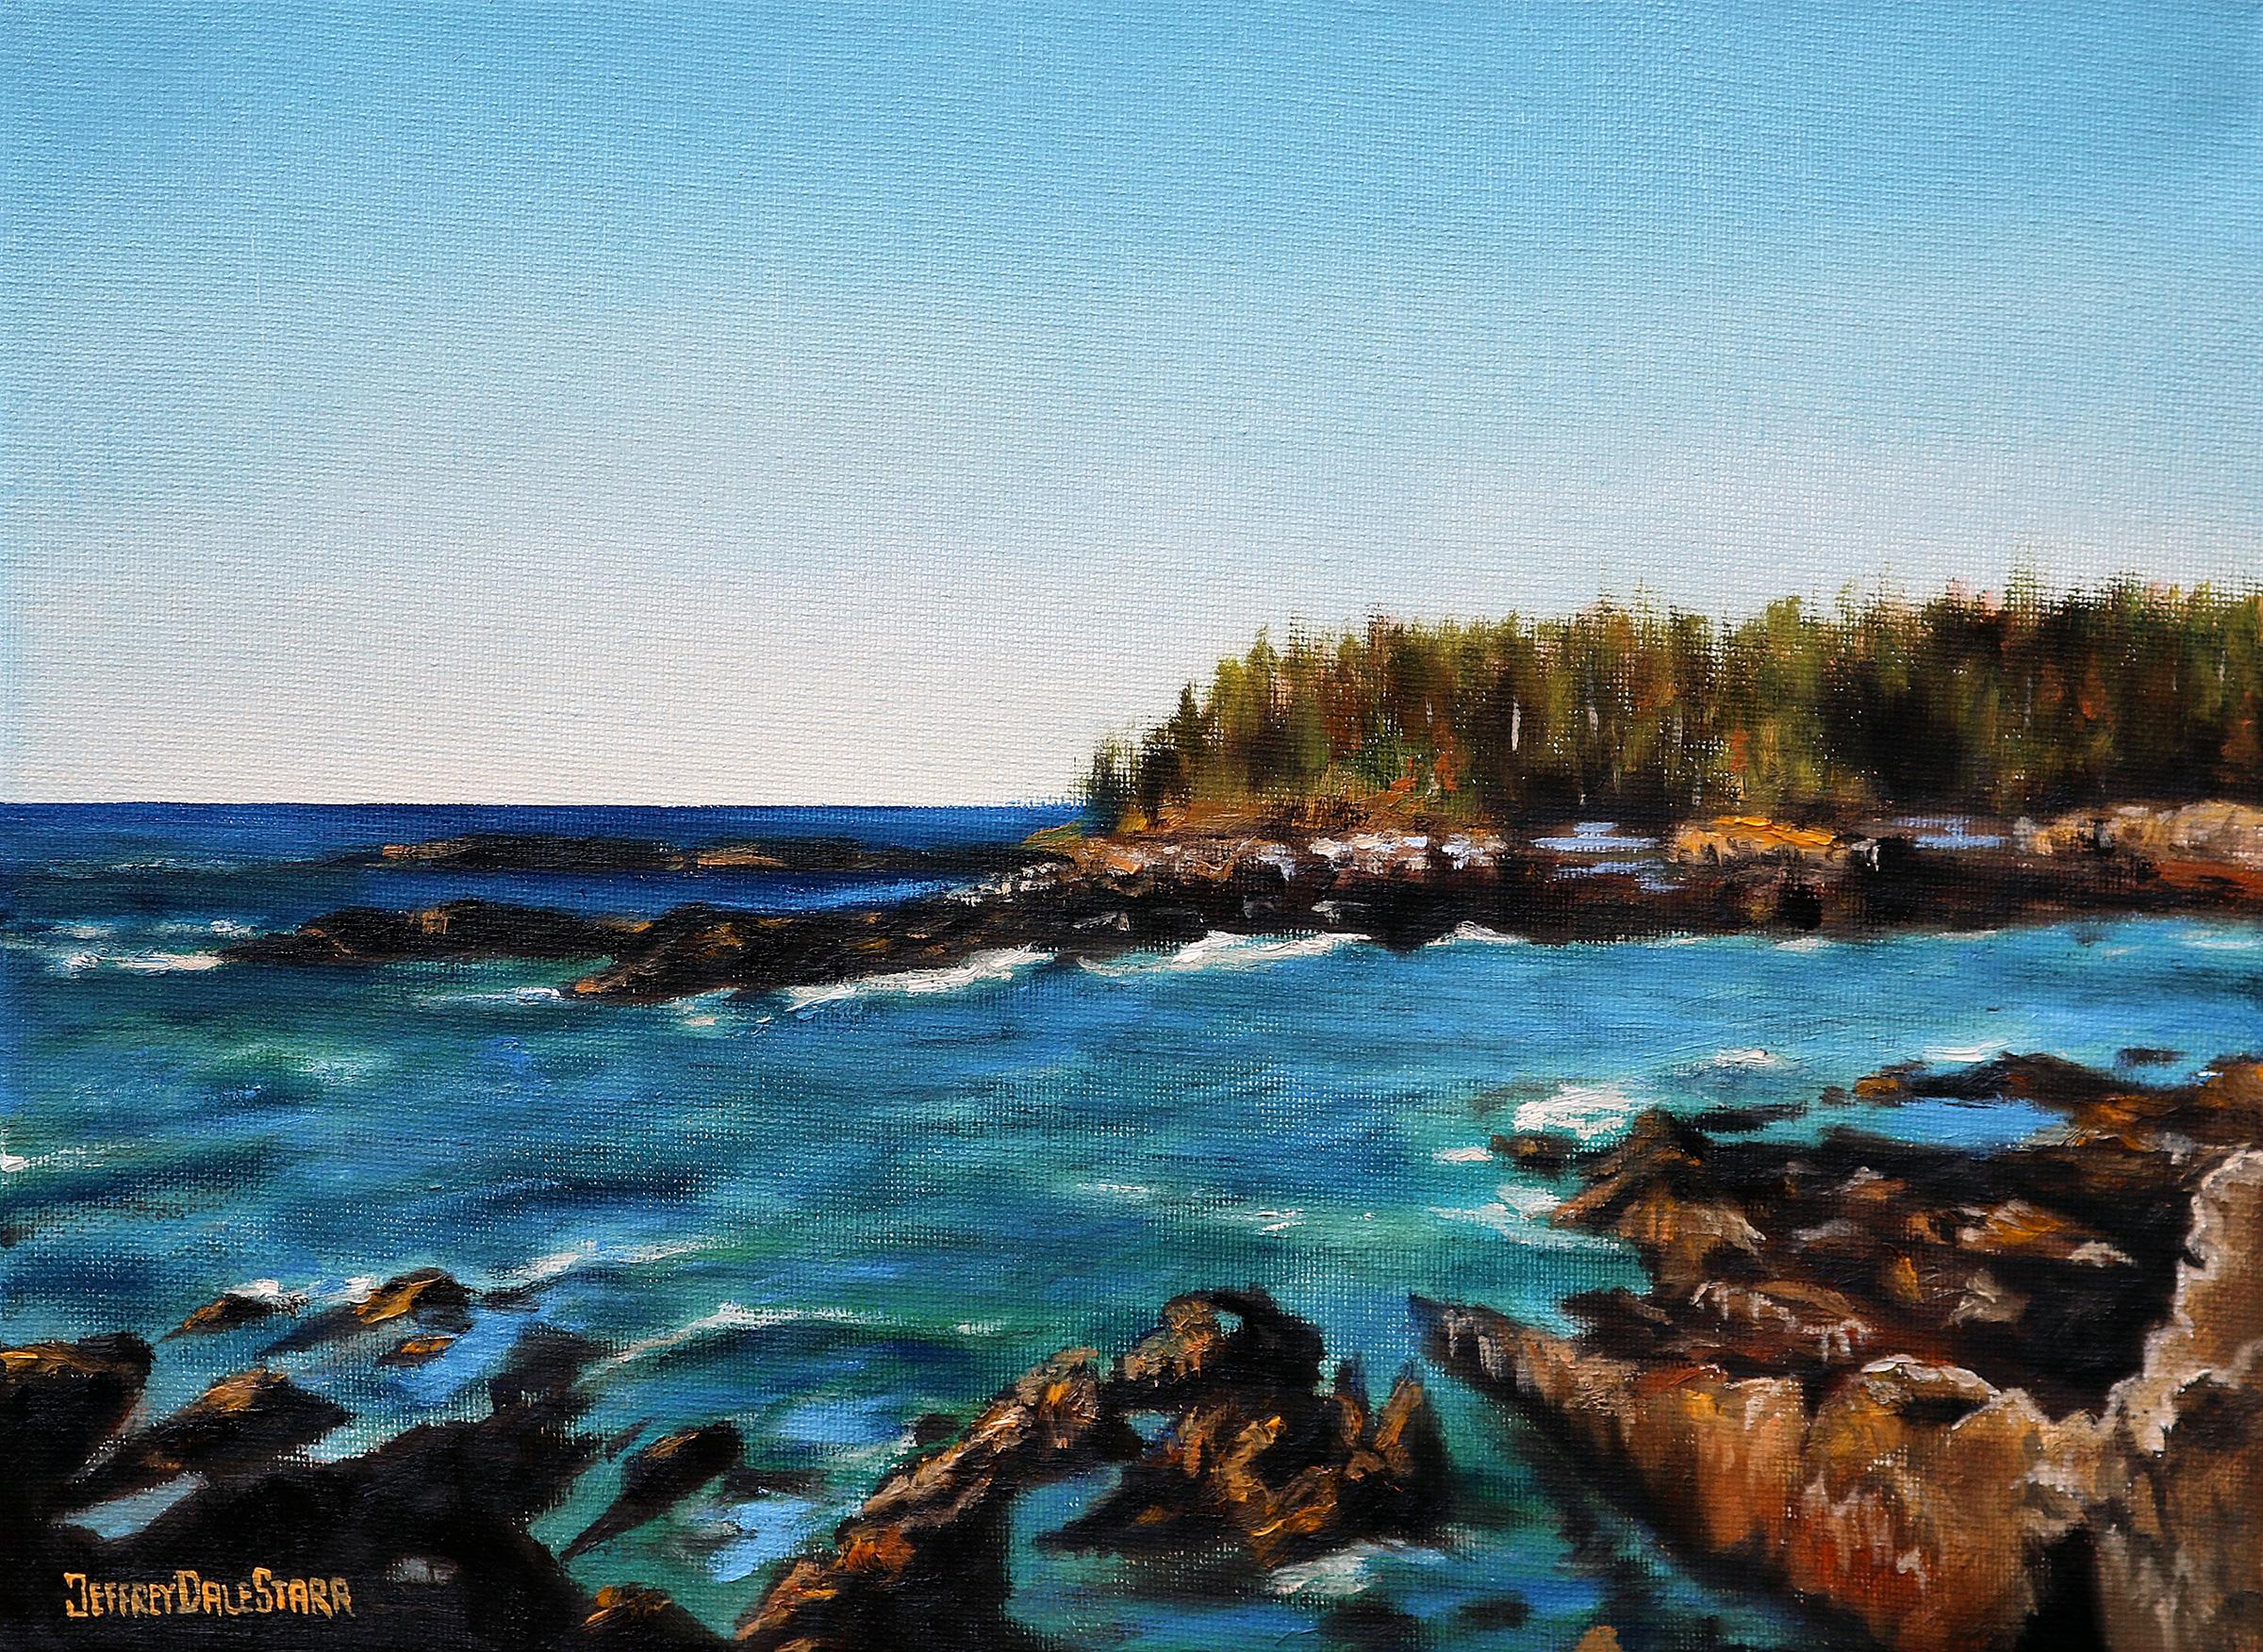 oil painting of rocky maine coastline by american artist jeffrey dale starr